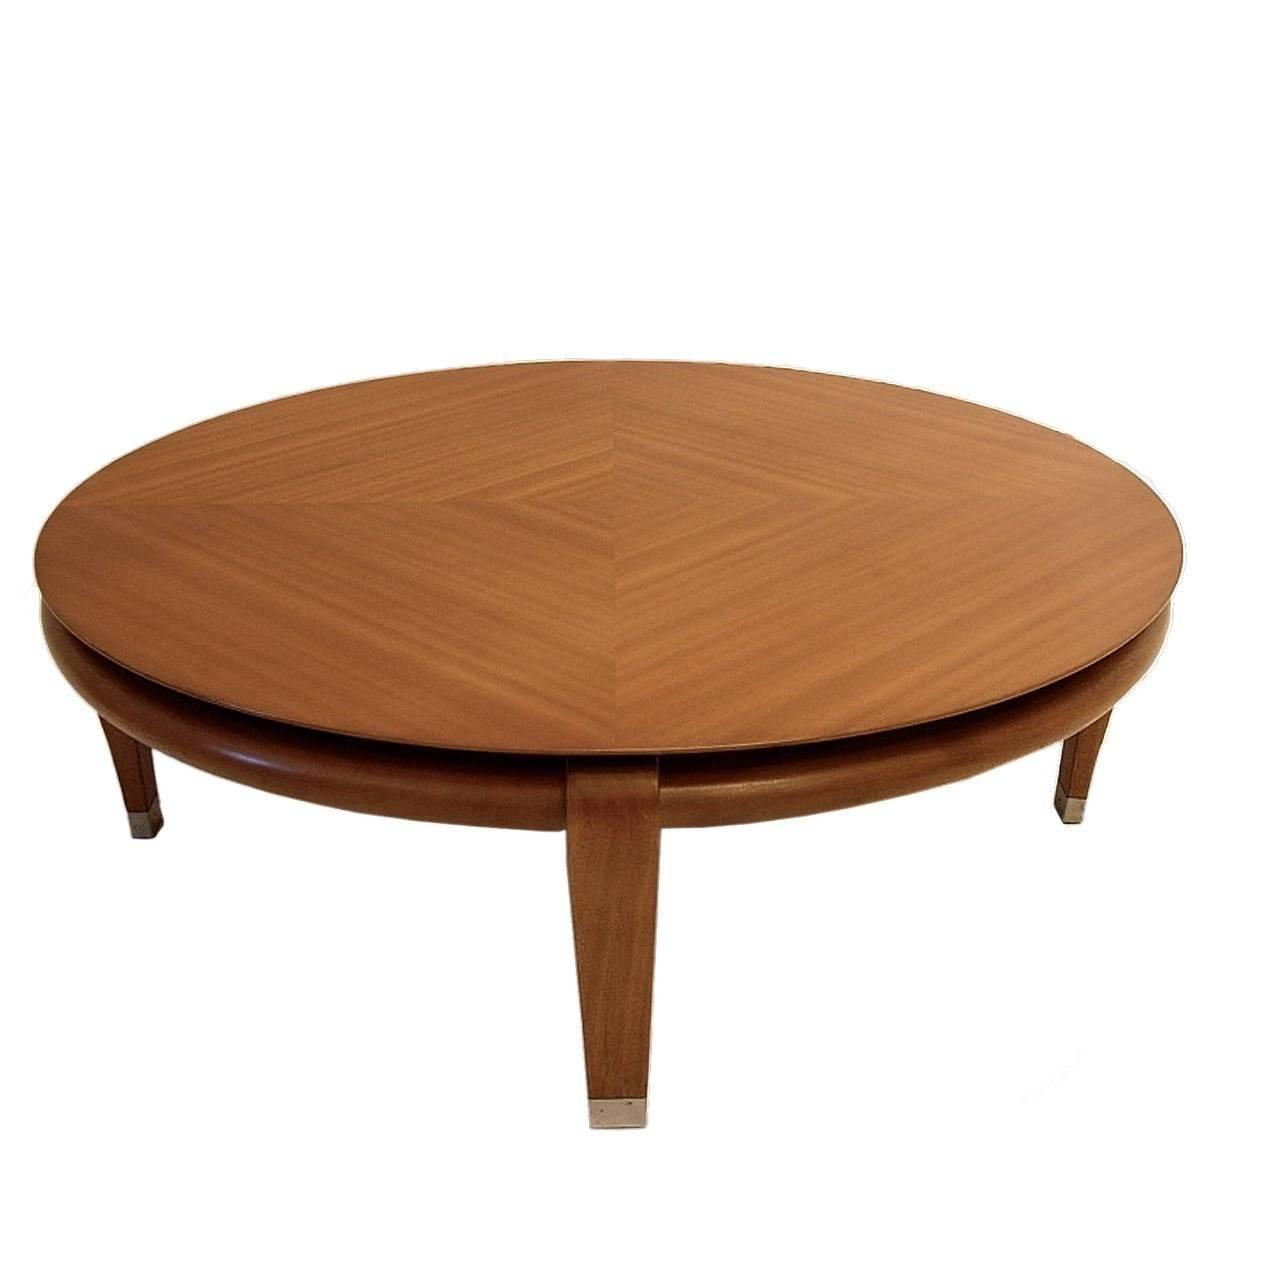 Paul Laszlo For Brown Saltman Round Coffee Table In Mahogany for Mahogany Coffee Tables (Image 29 of 30)